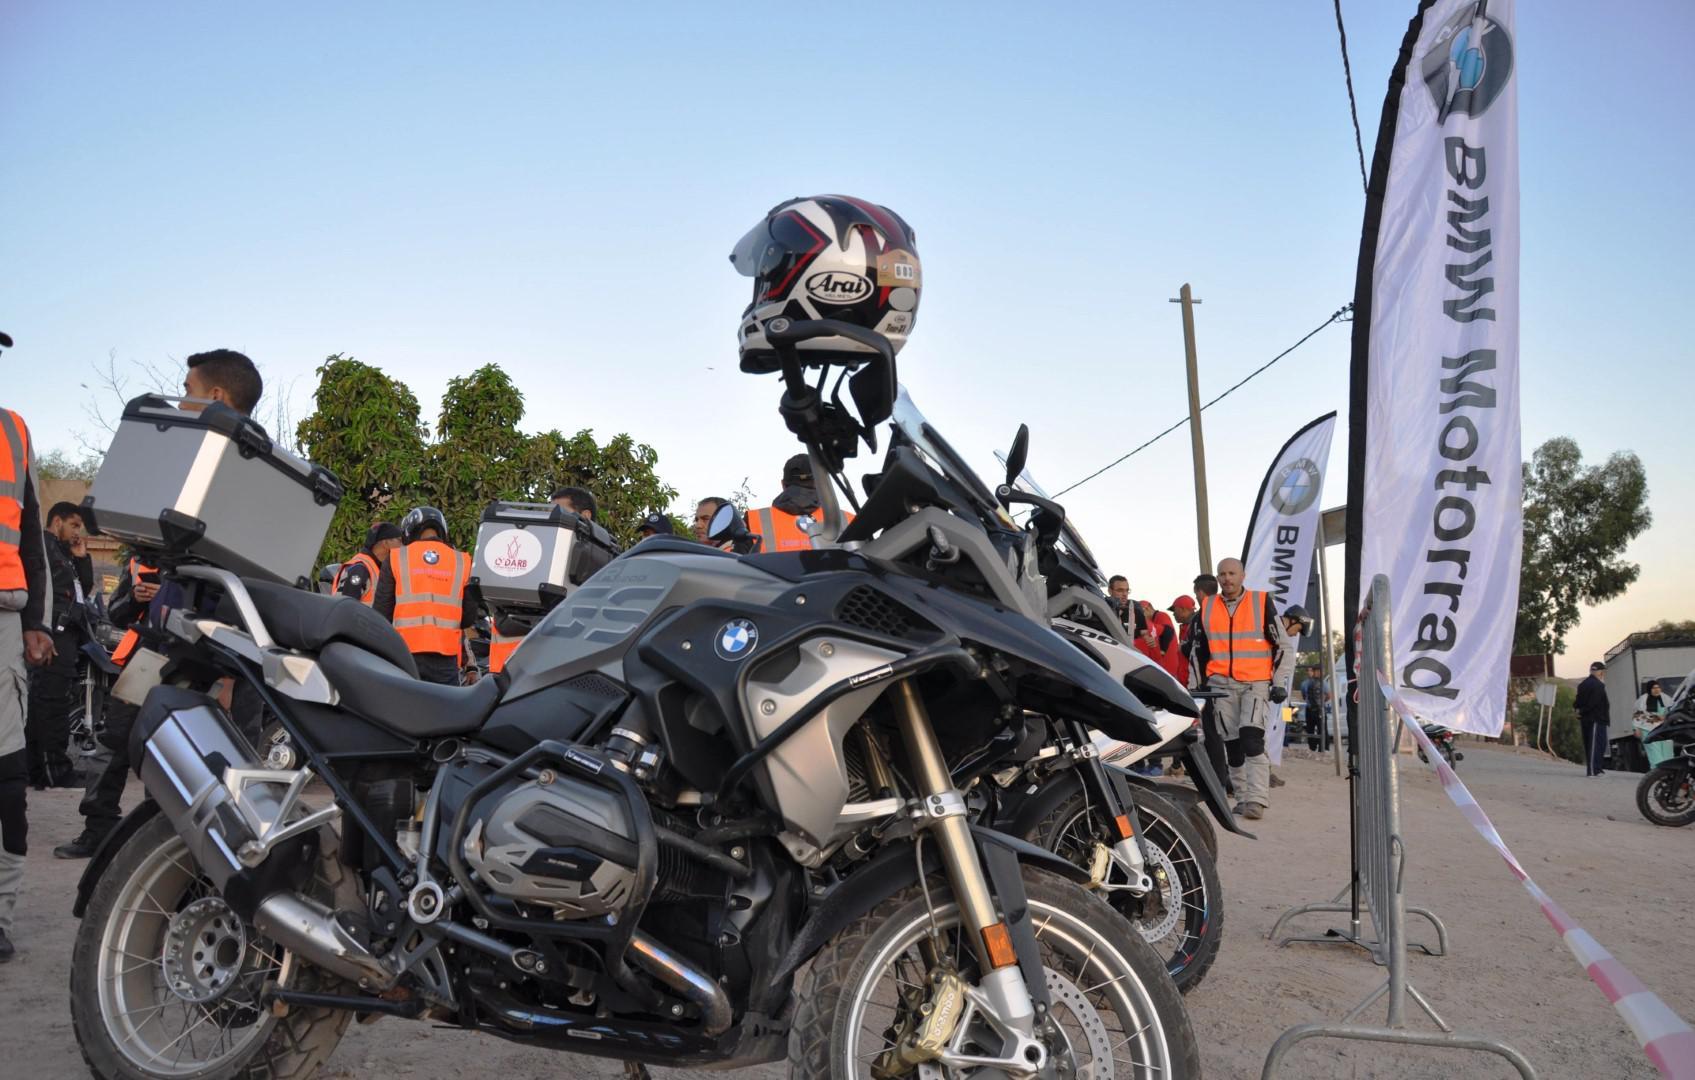 bwm-motorrad-morocco-iron-man-morocco-1143-2.jpg